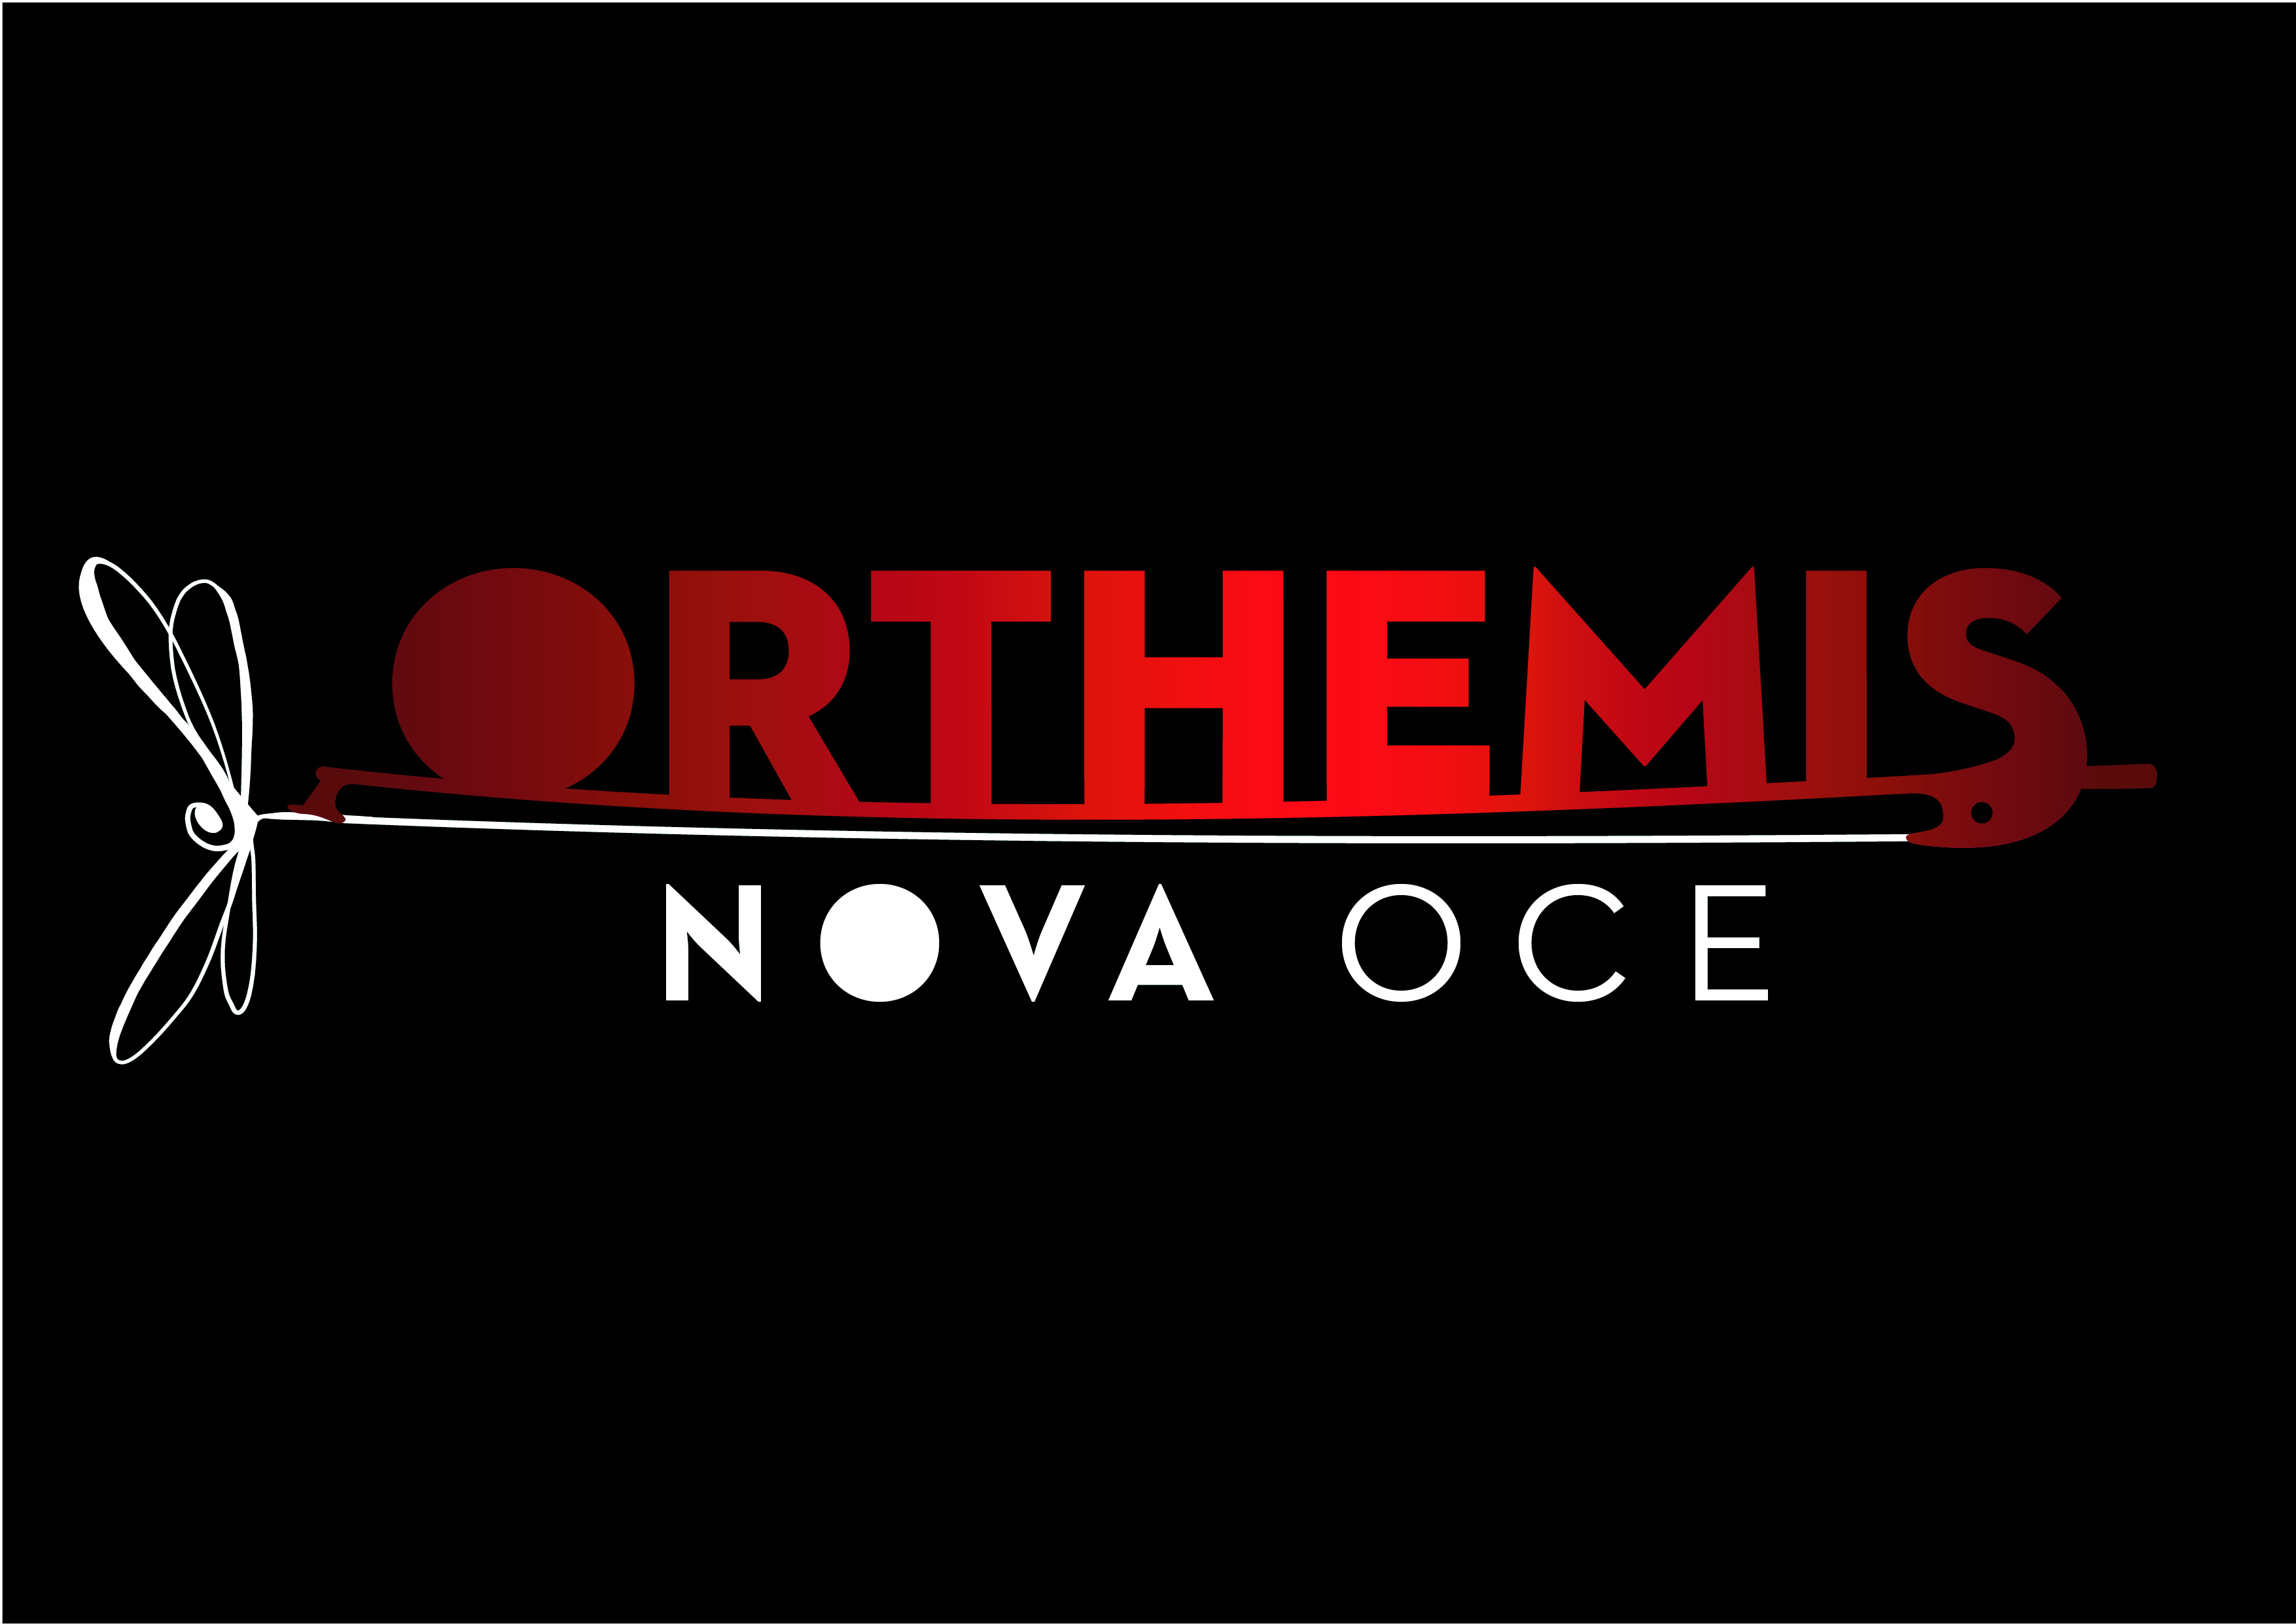 ORTHEMIS_COLOR_ FONDO_OSCURO_print